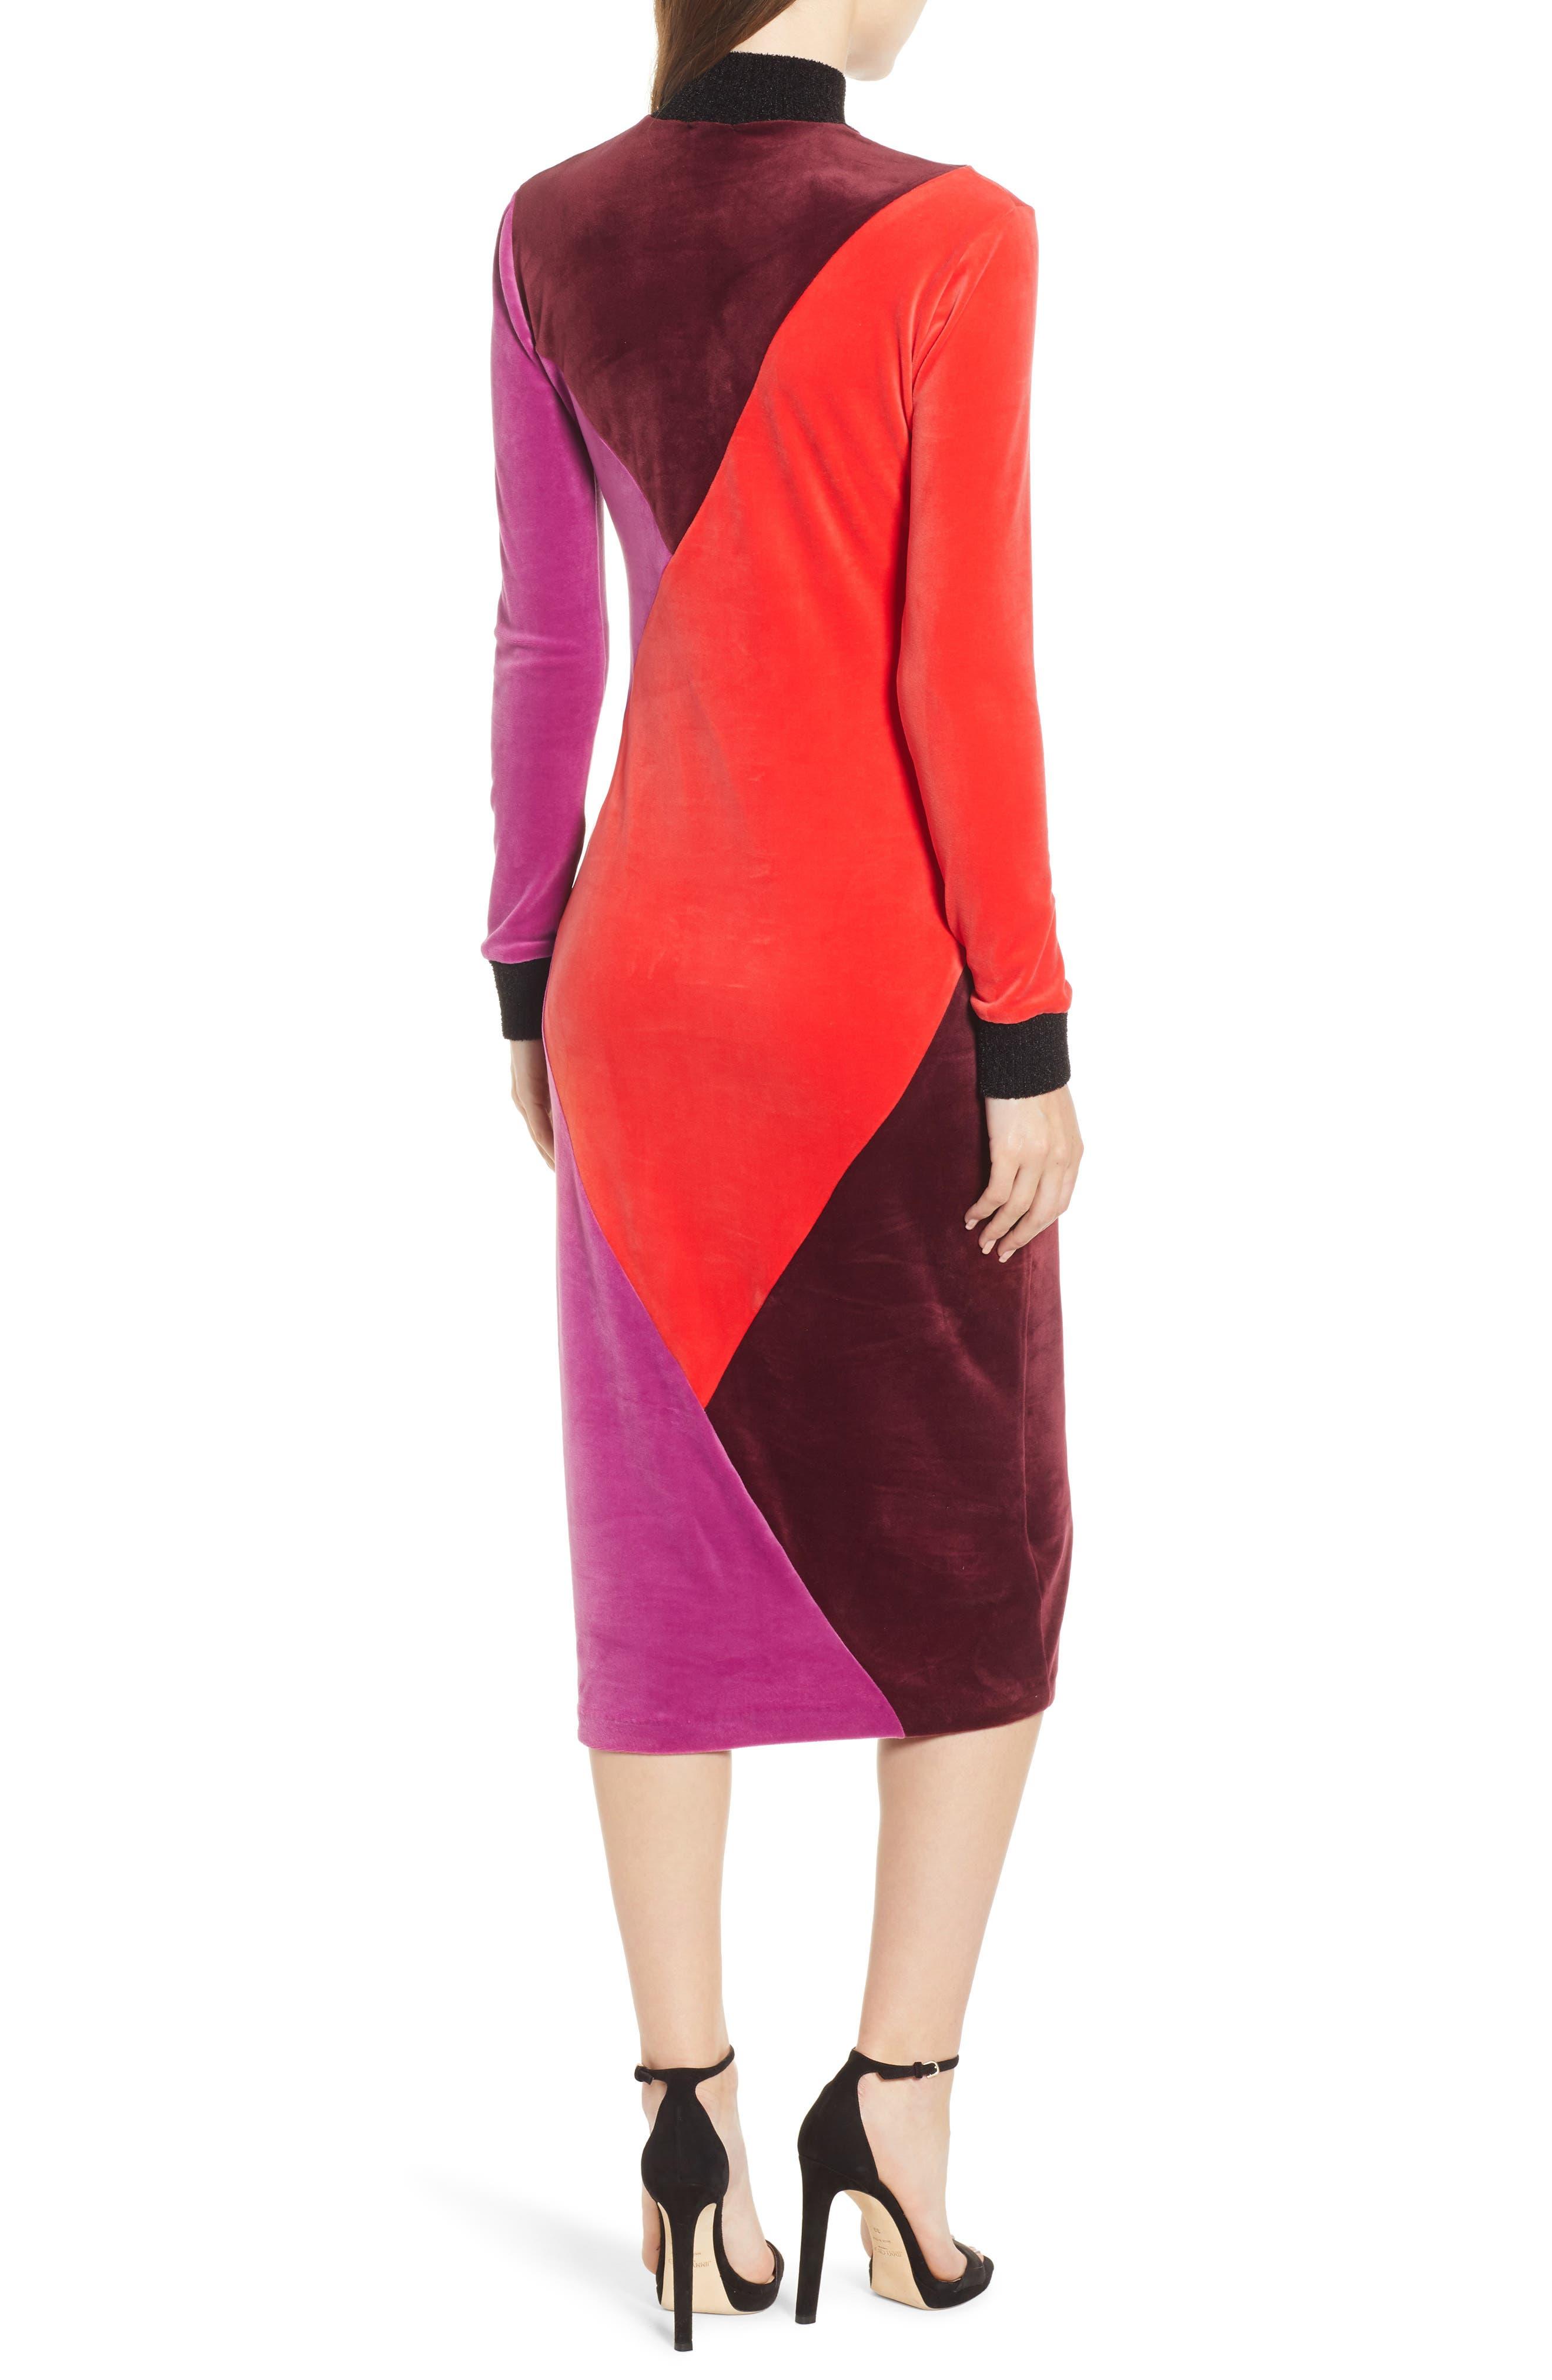 Velluto Velour Midi Dress,                             Alternate thumbnail 2, color,                             BORGOGNA